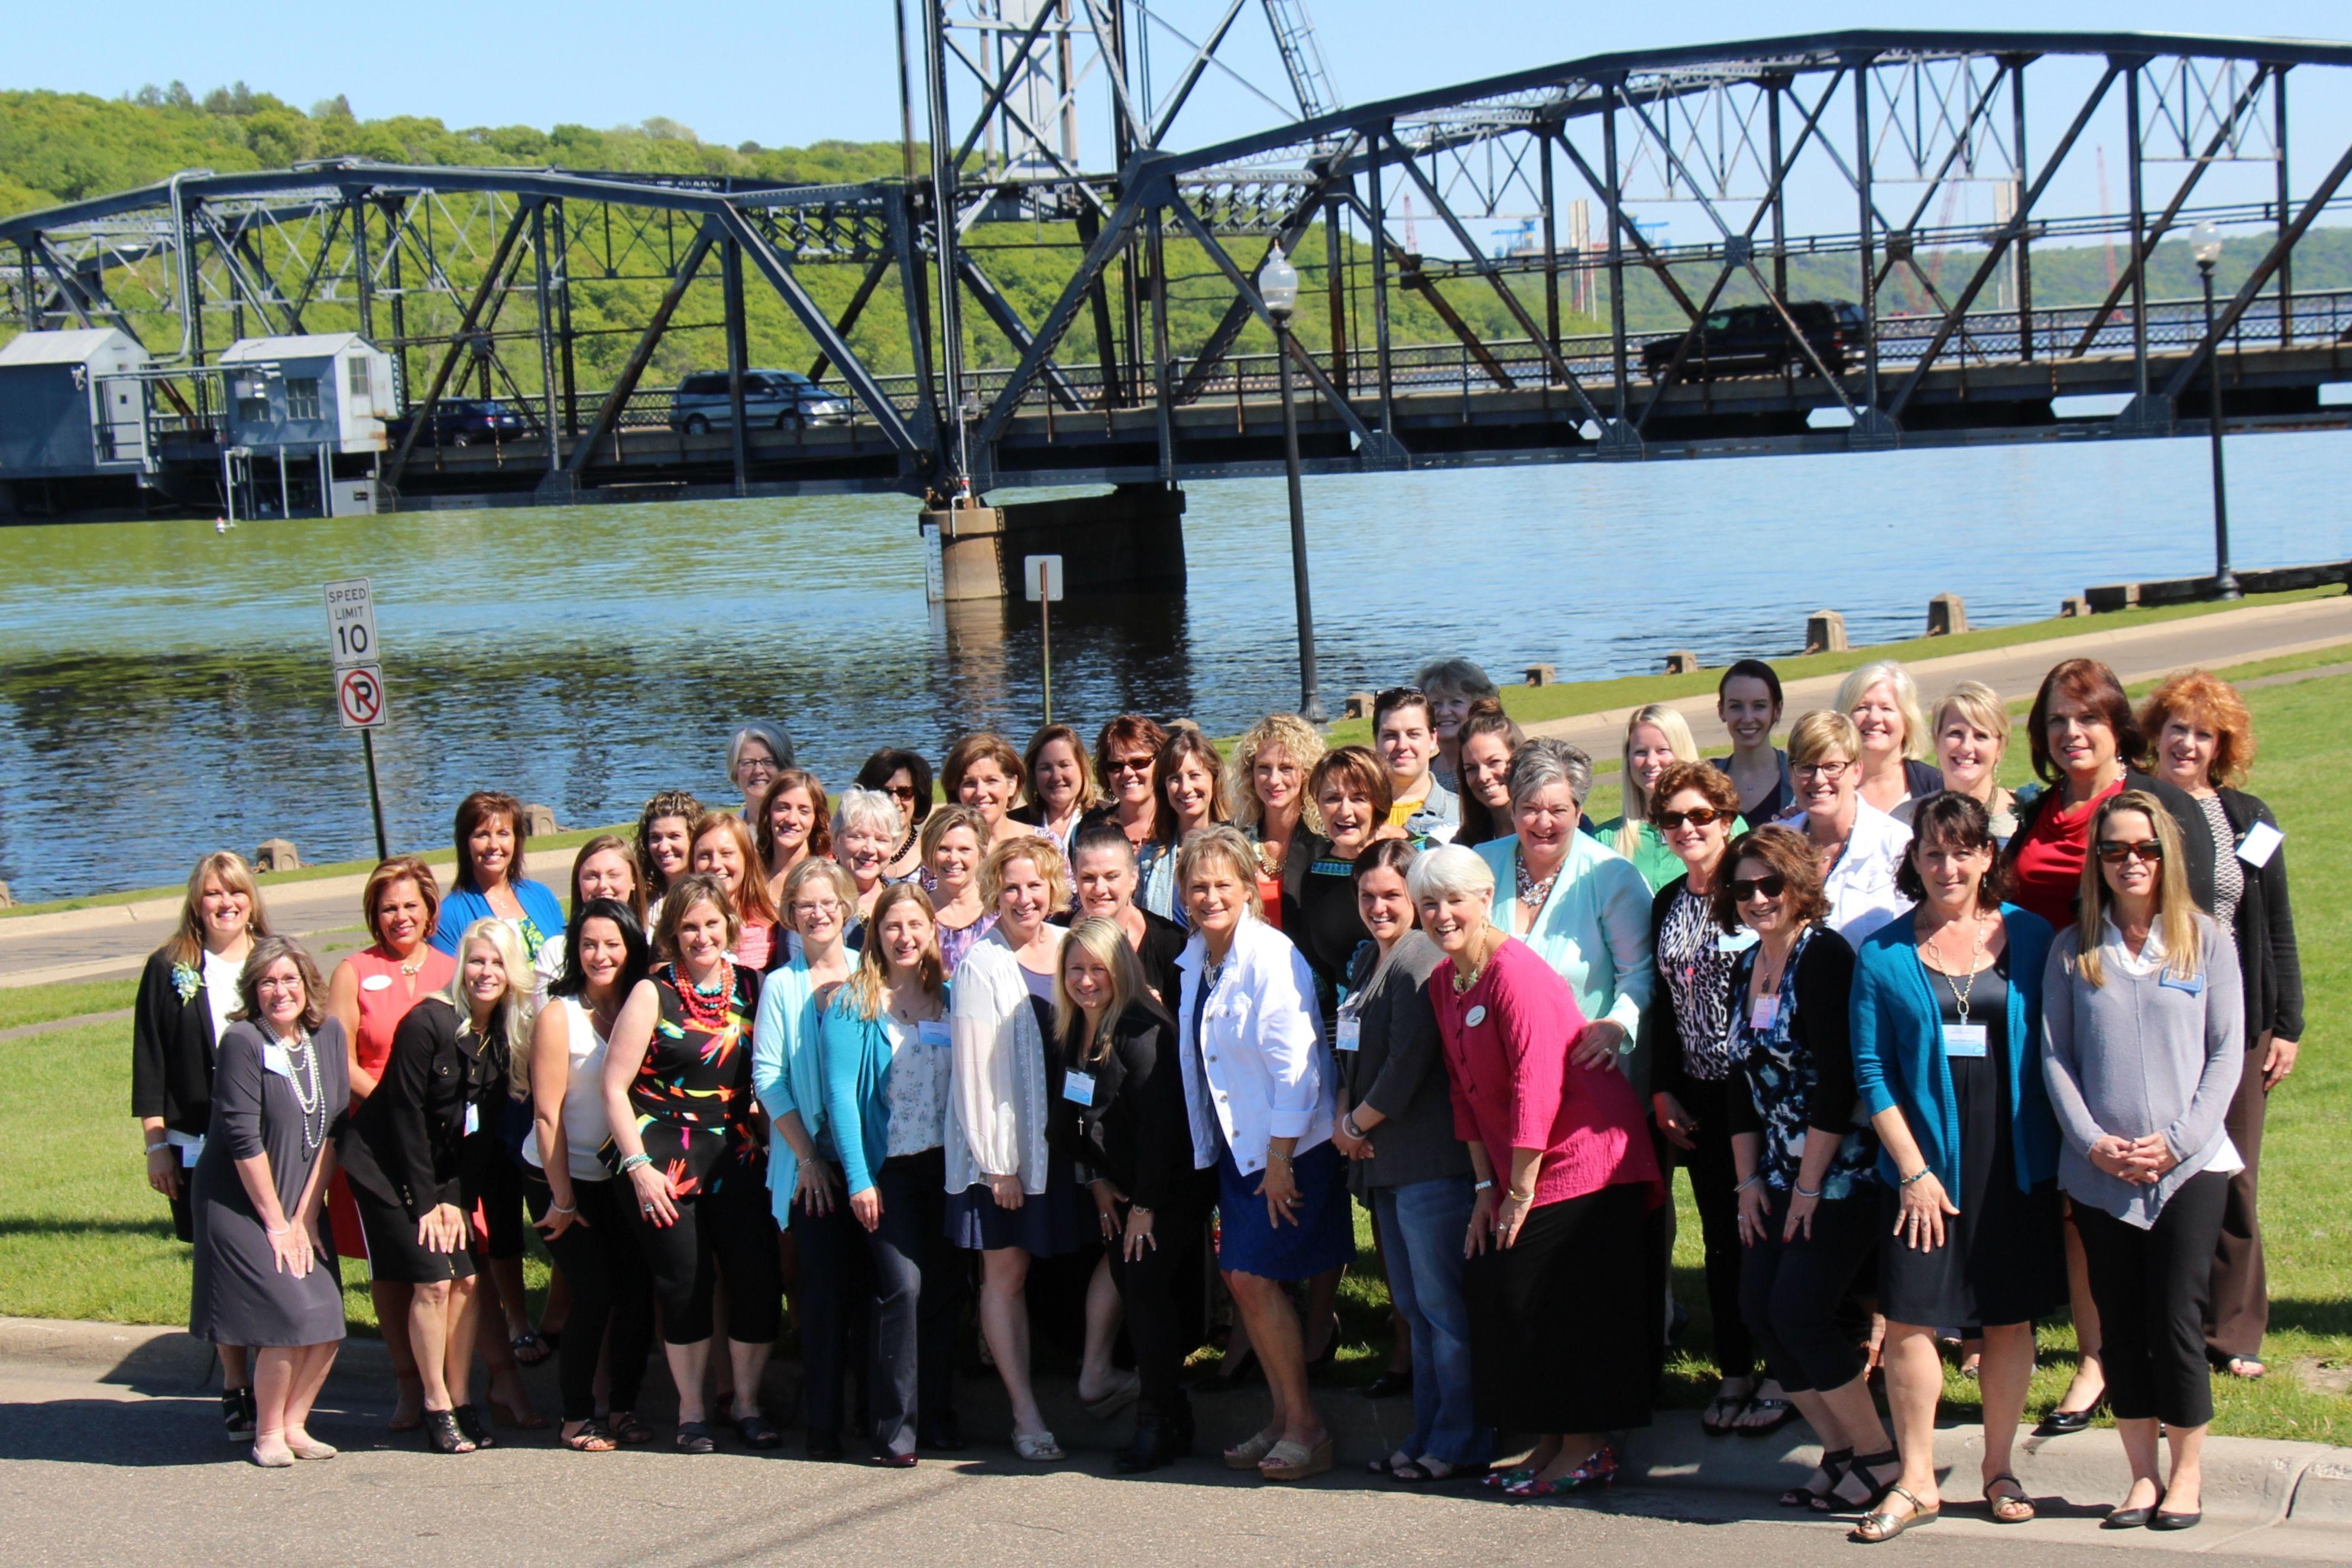 Women's Business Bridge